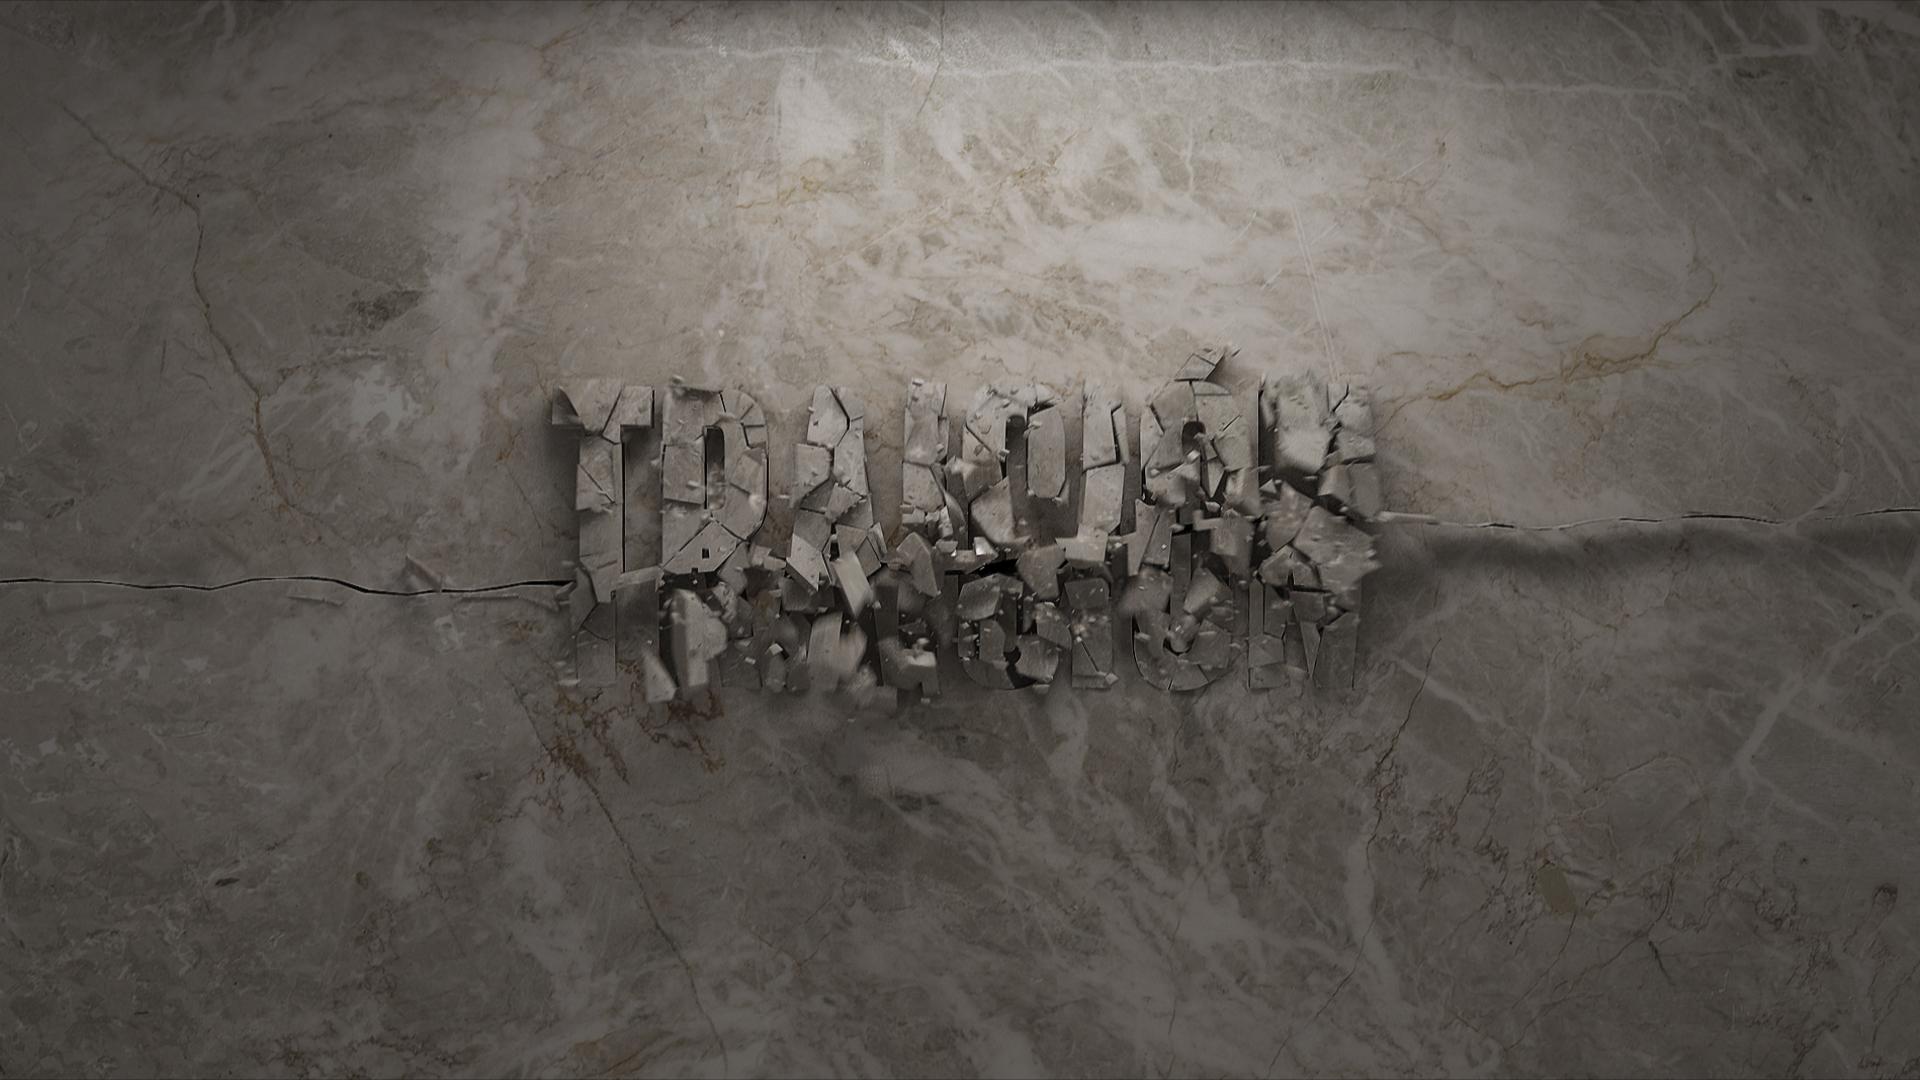 serie-traicion-tve-animacion-3d-explosion-escultura-7-1920x1080-1.jpg